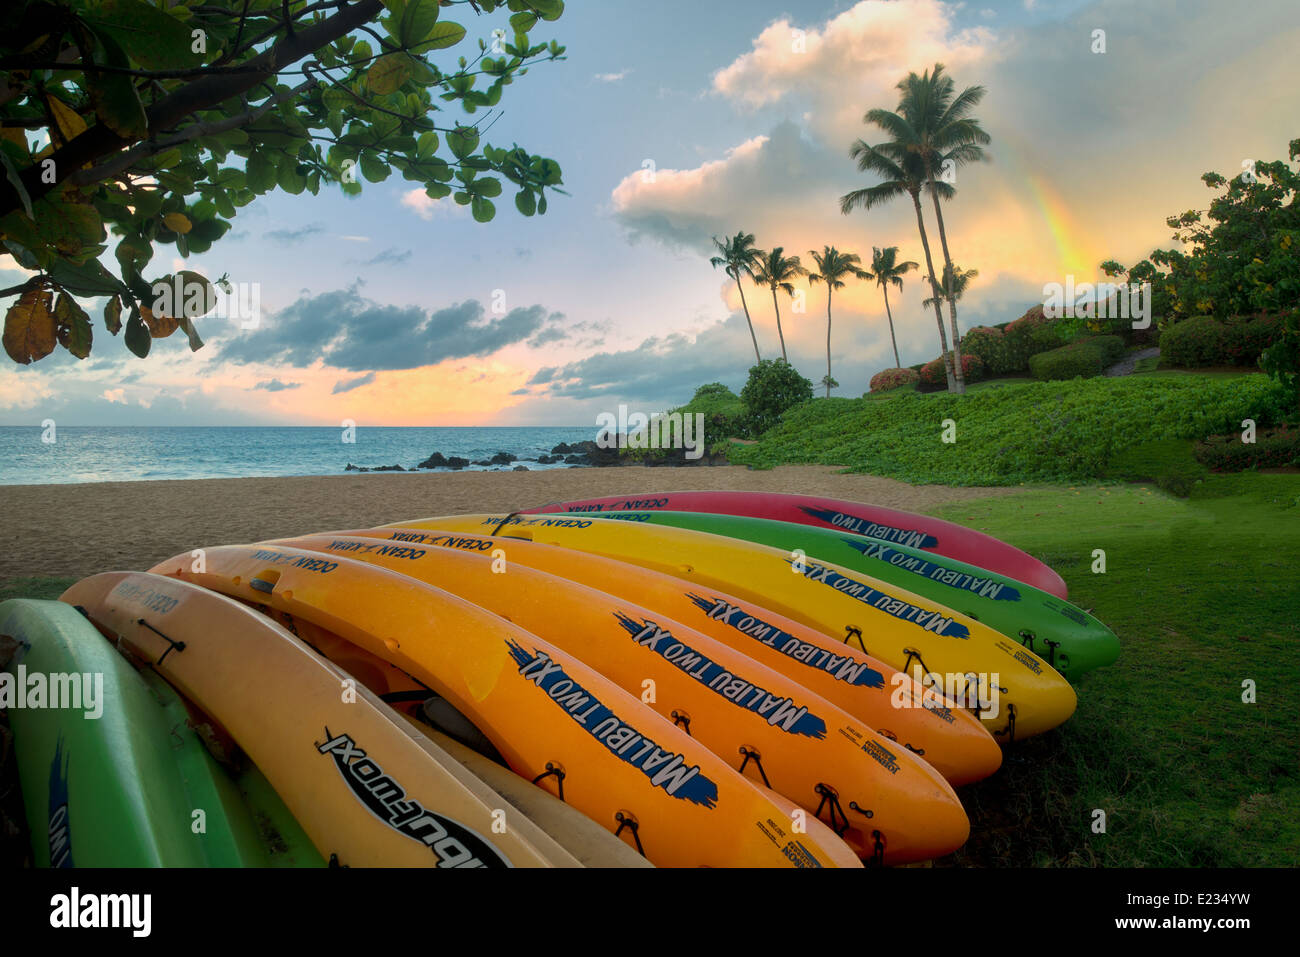 Kayaks on beach with rainbow. Maui, Hawaii - Stock Image